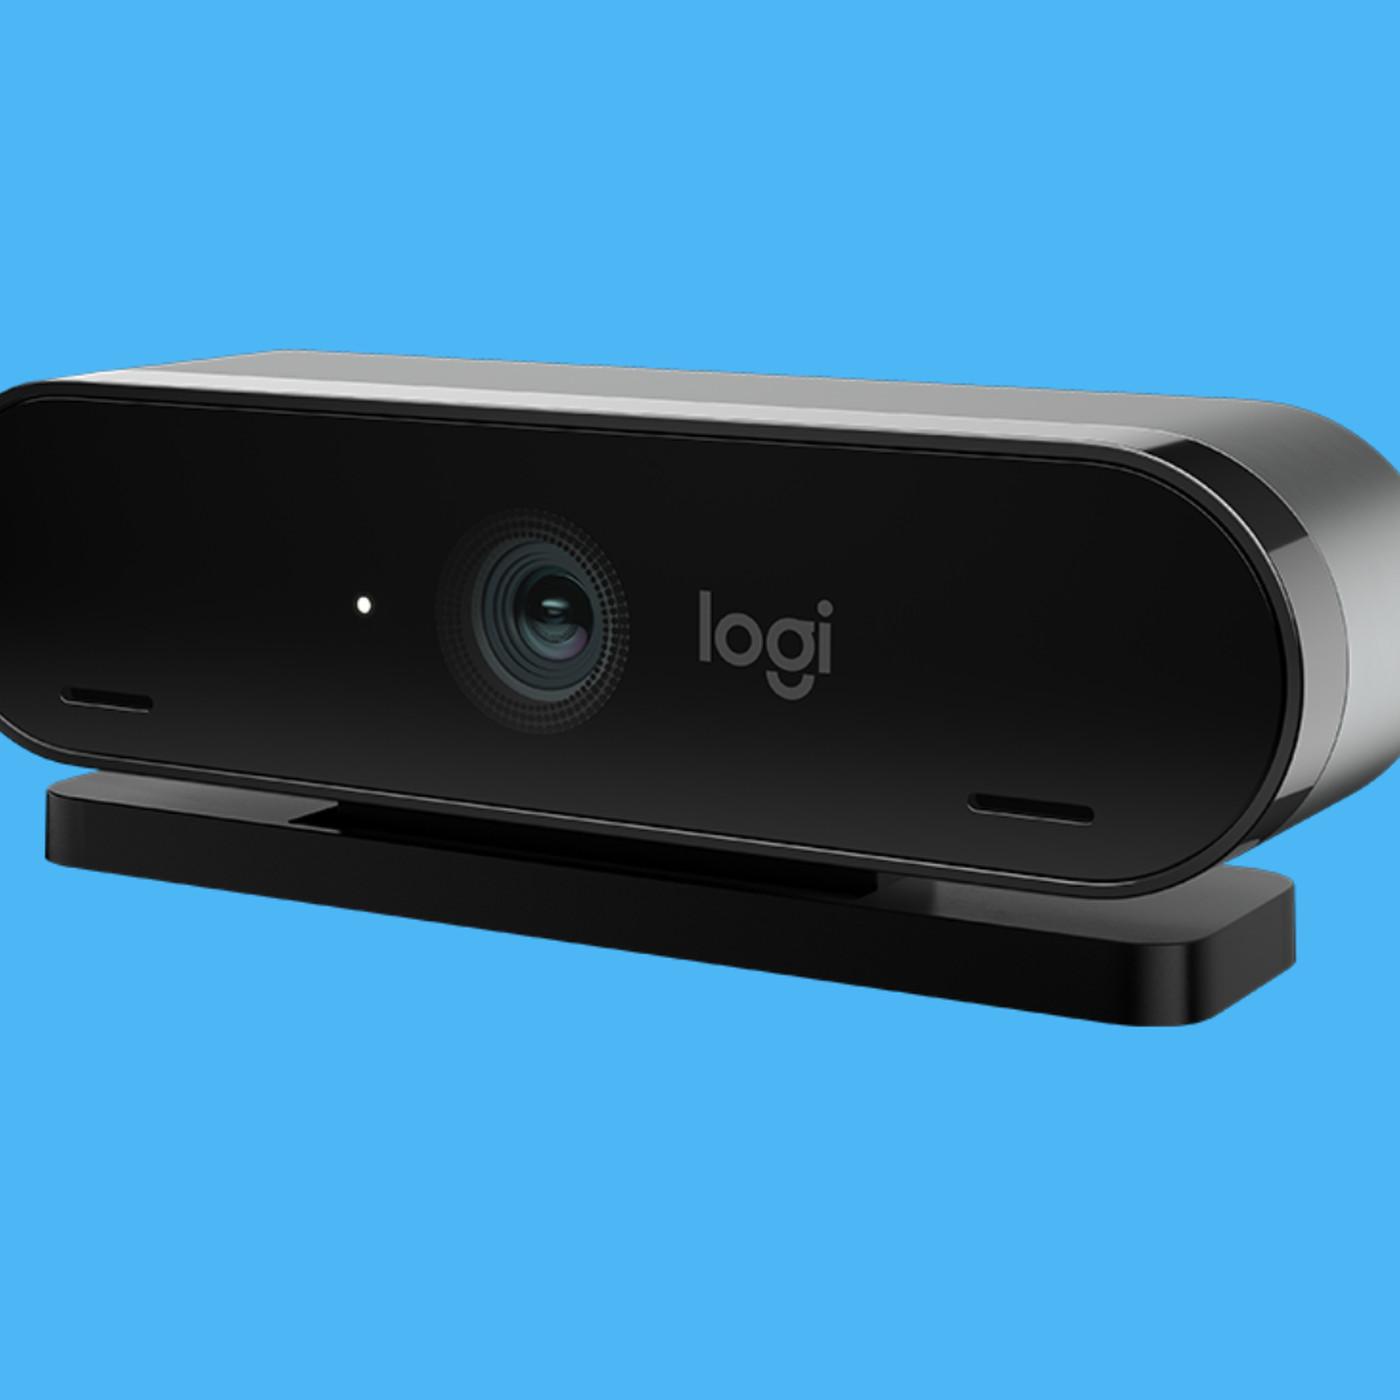 Logitech Made A Bespoke 200 Magnetic 4k Webcam For Apple S Pro